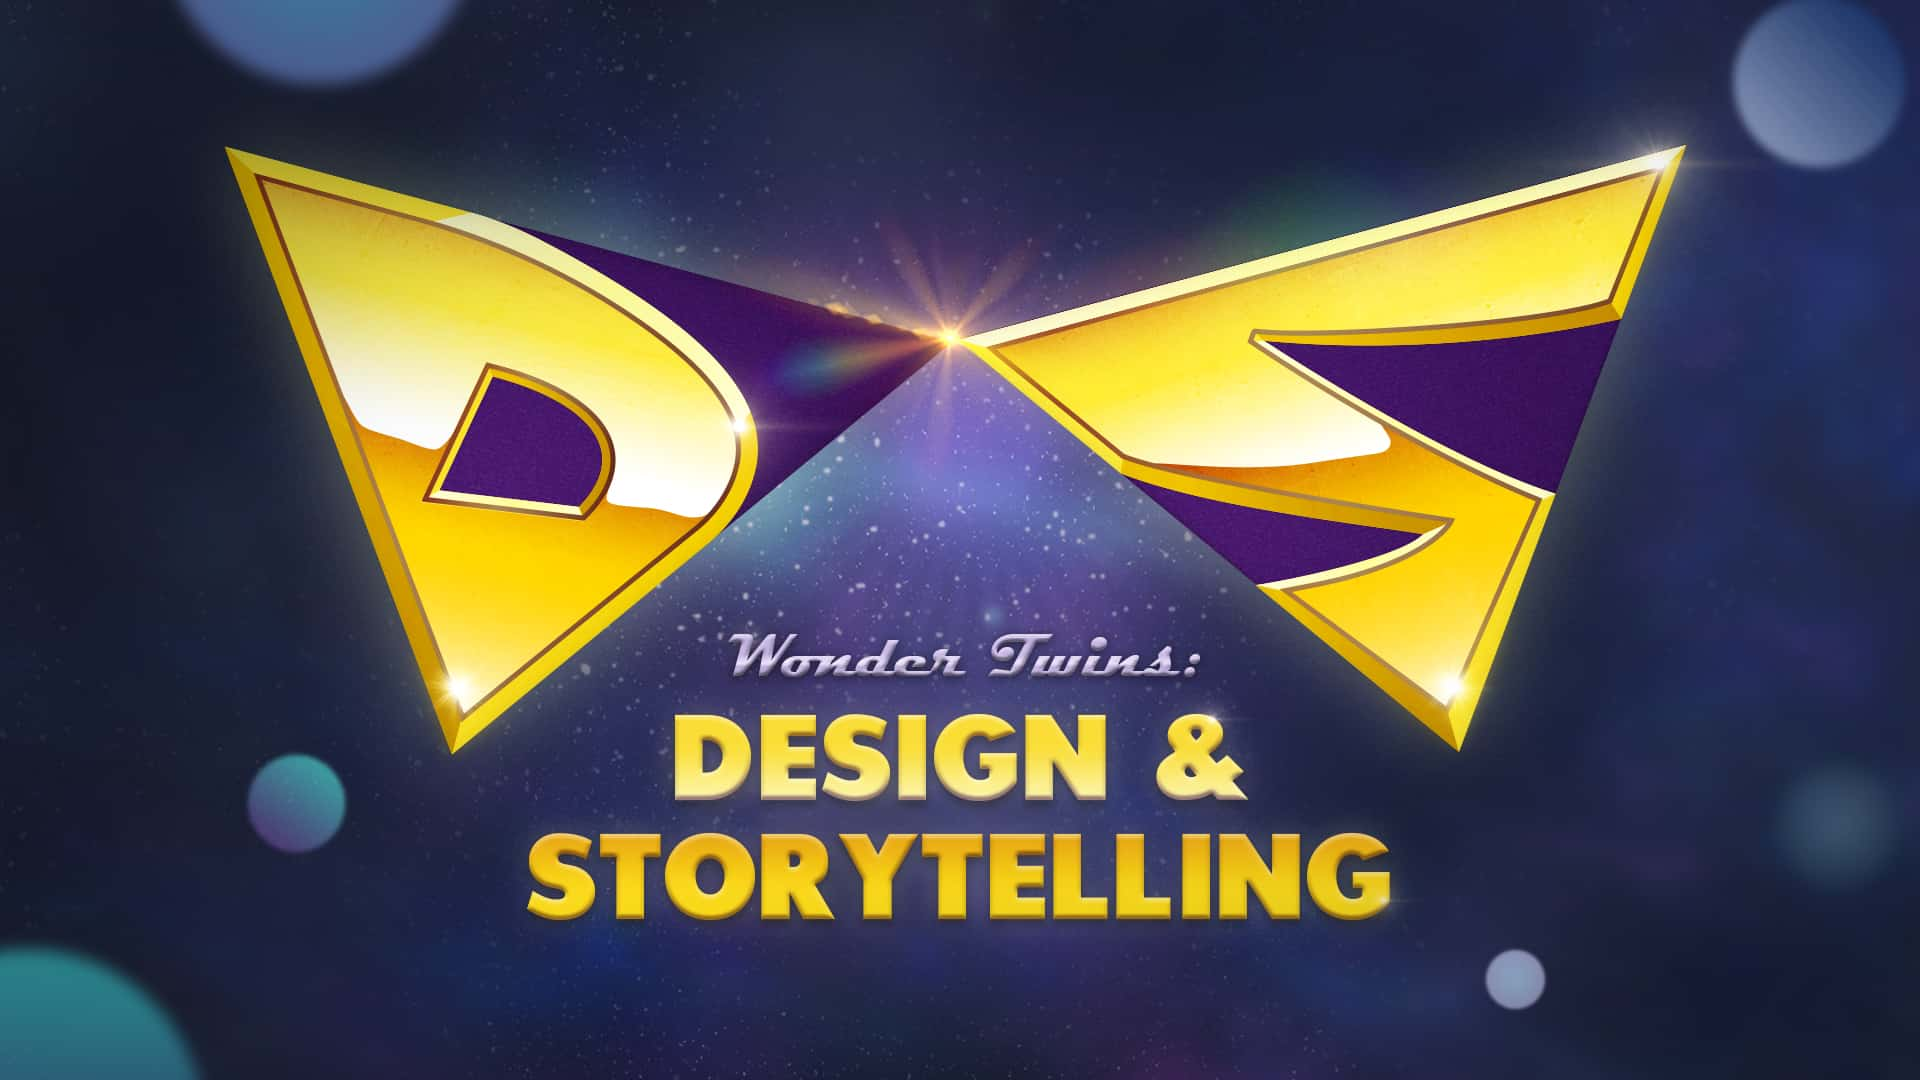 Wonder Team activates to deliver superhuman marketing solutions